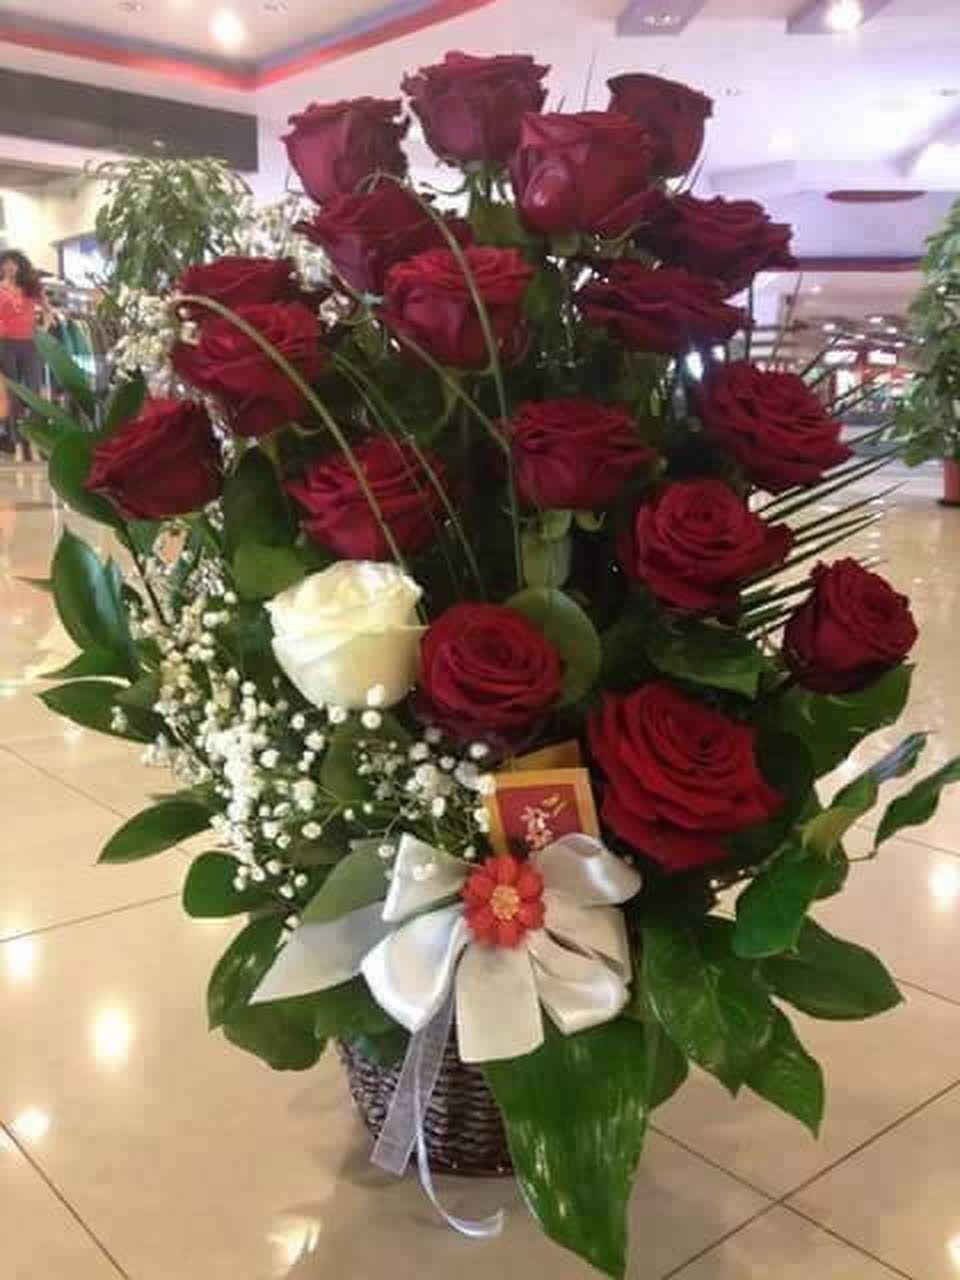 Pin by Aly Szymczak on Life Flower arrangements, Red